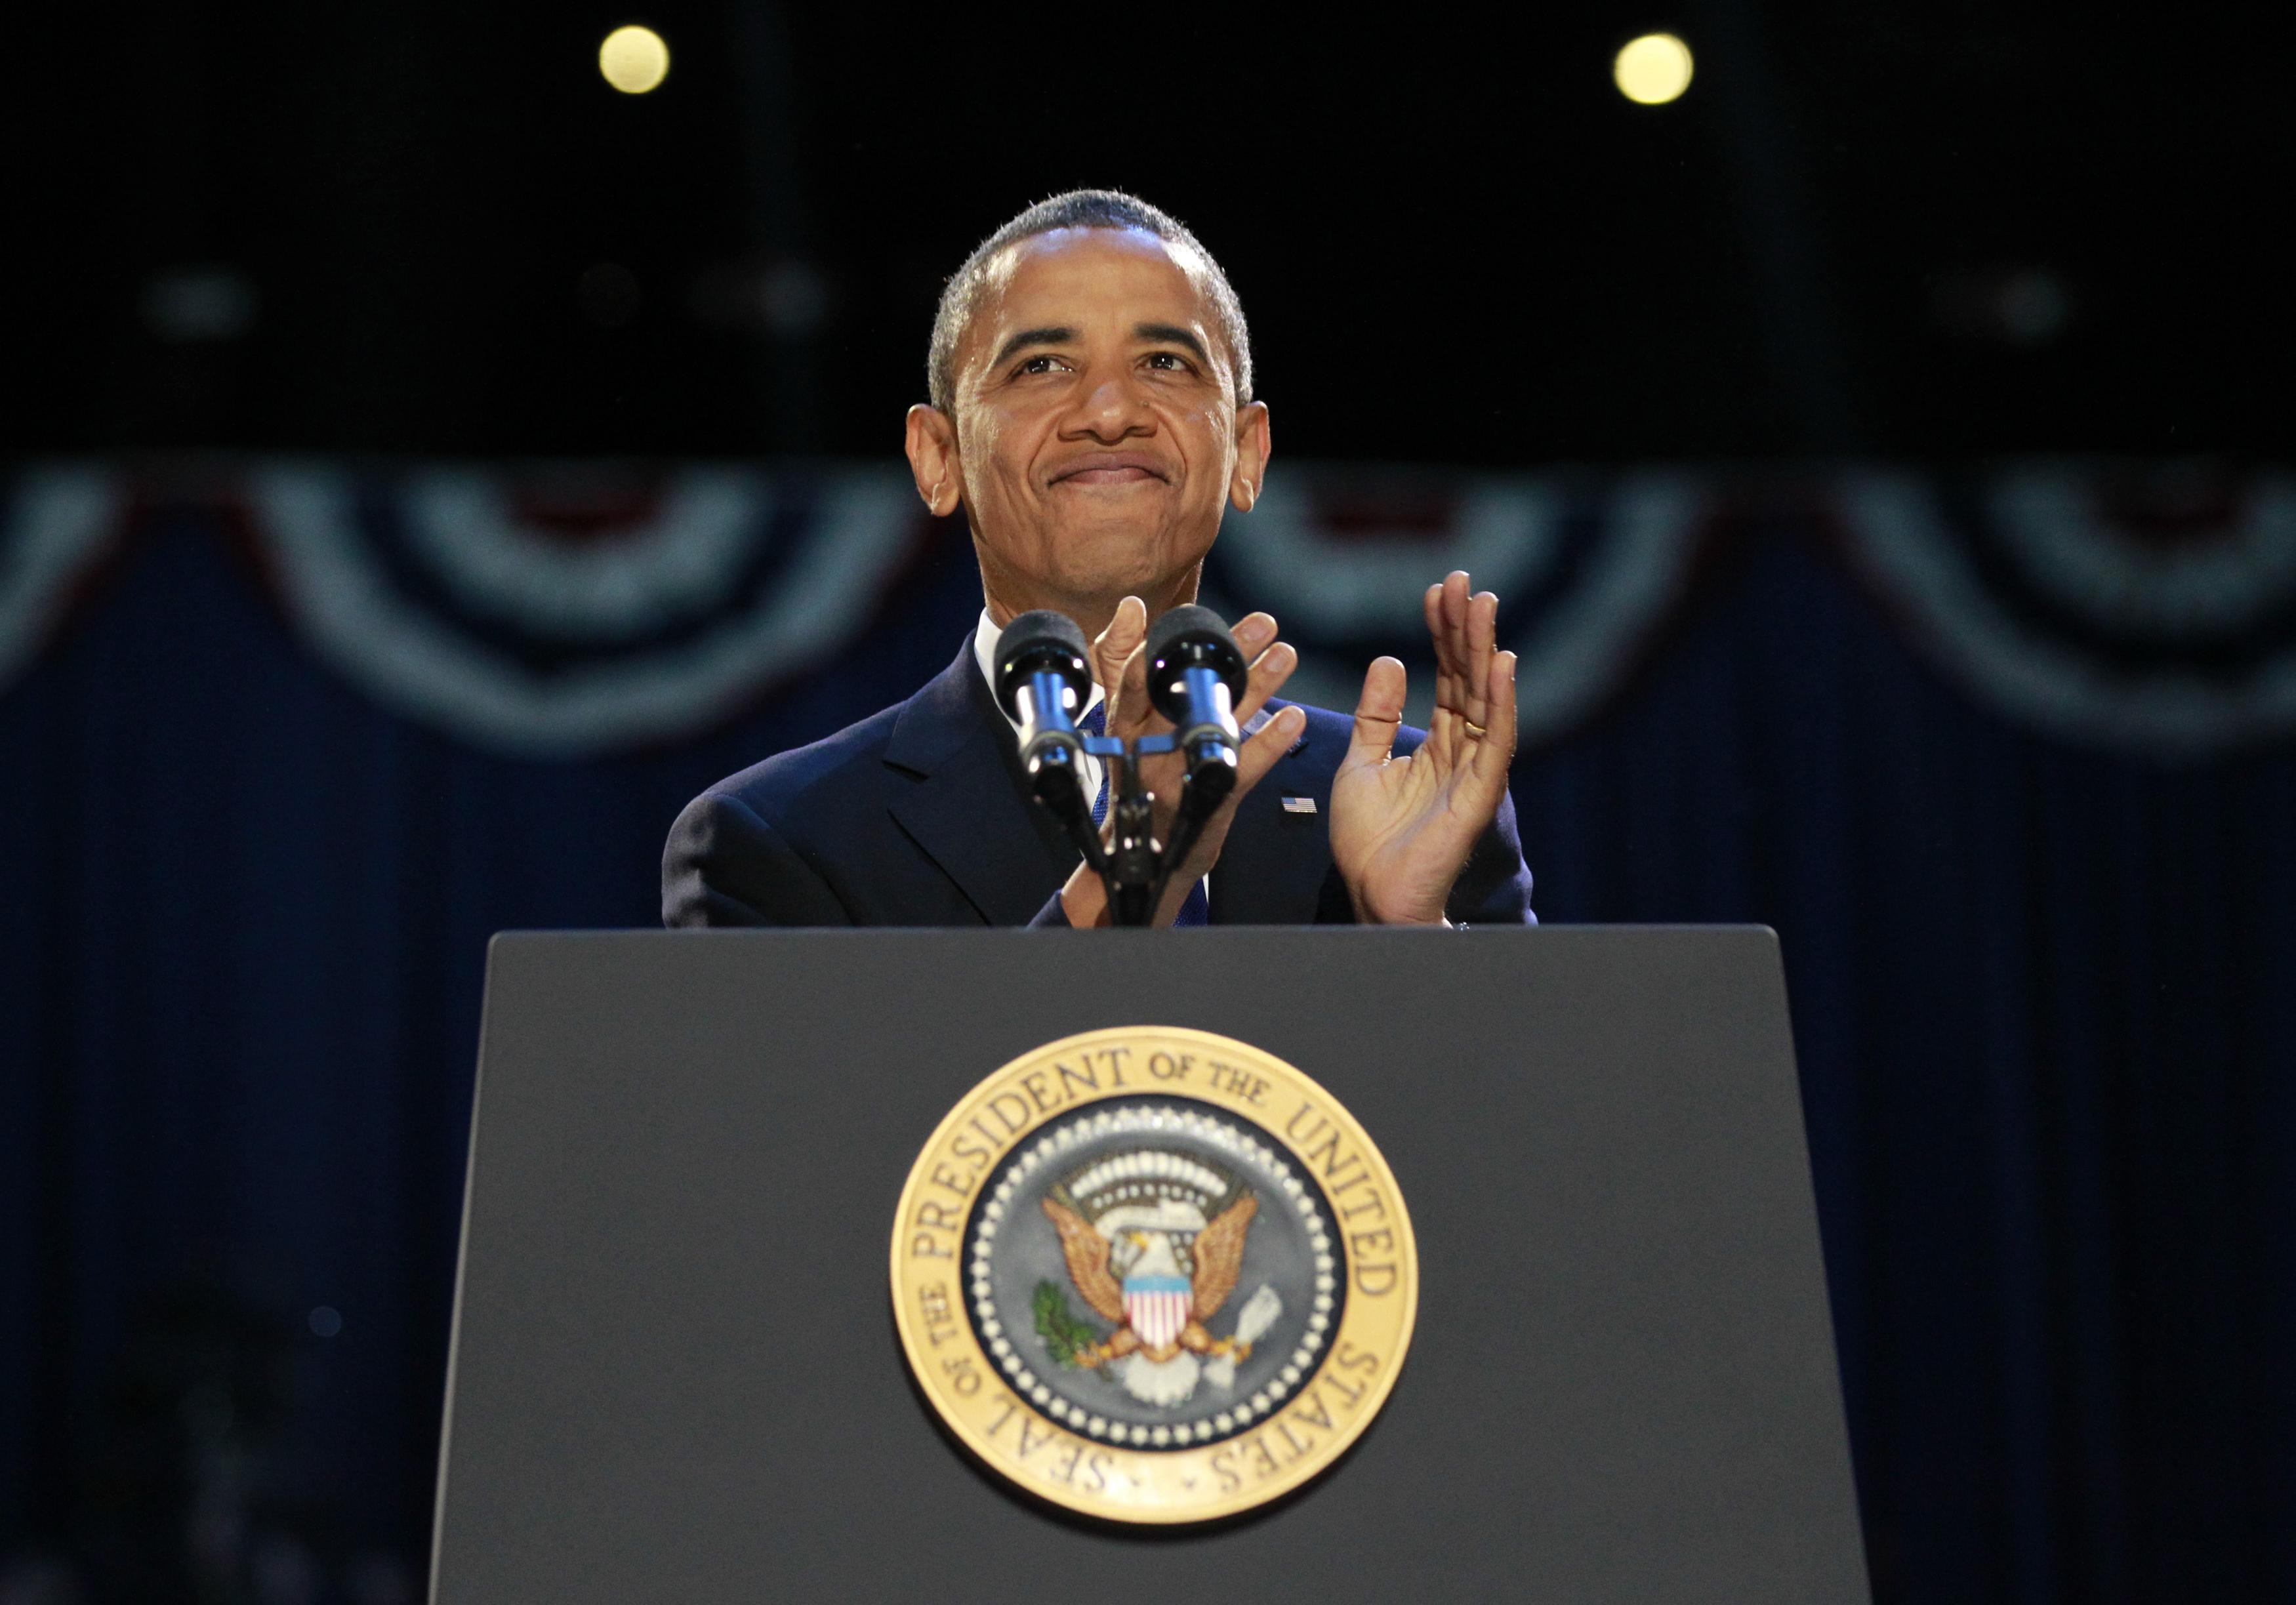 Presidential victory speech